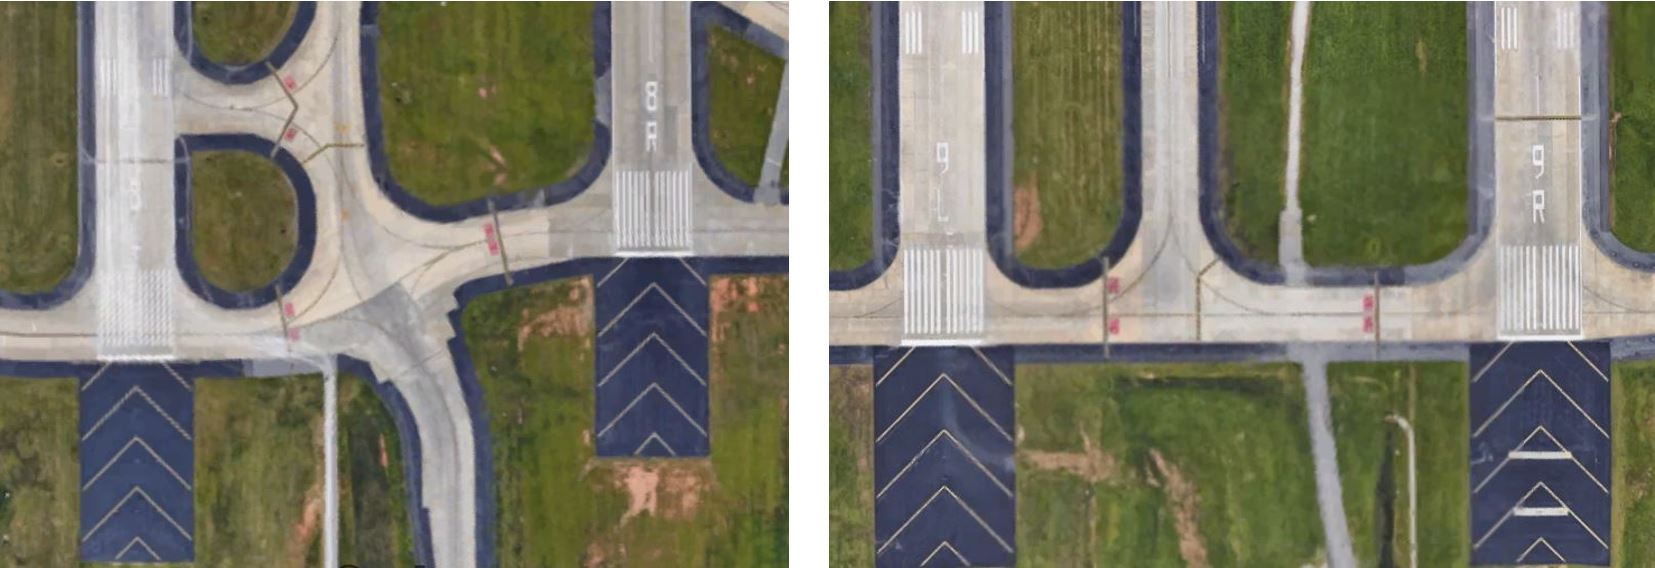 Figure 5 : Four Parallel Runways at Hartsfield-Jackson, ATL